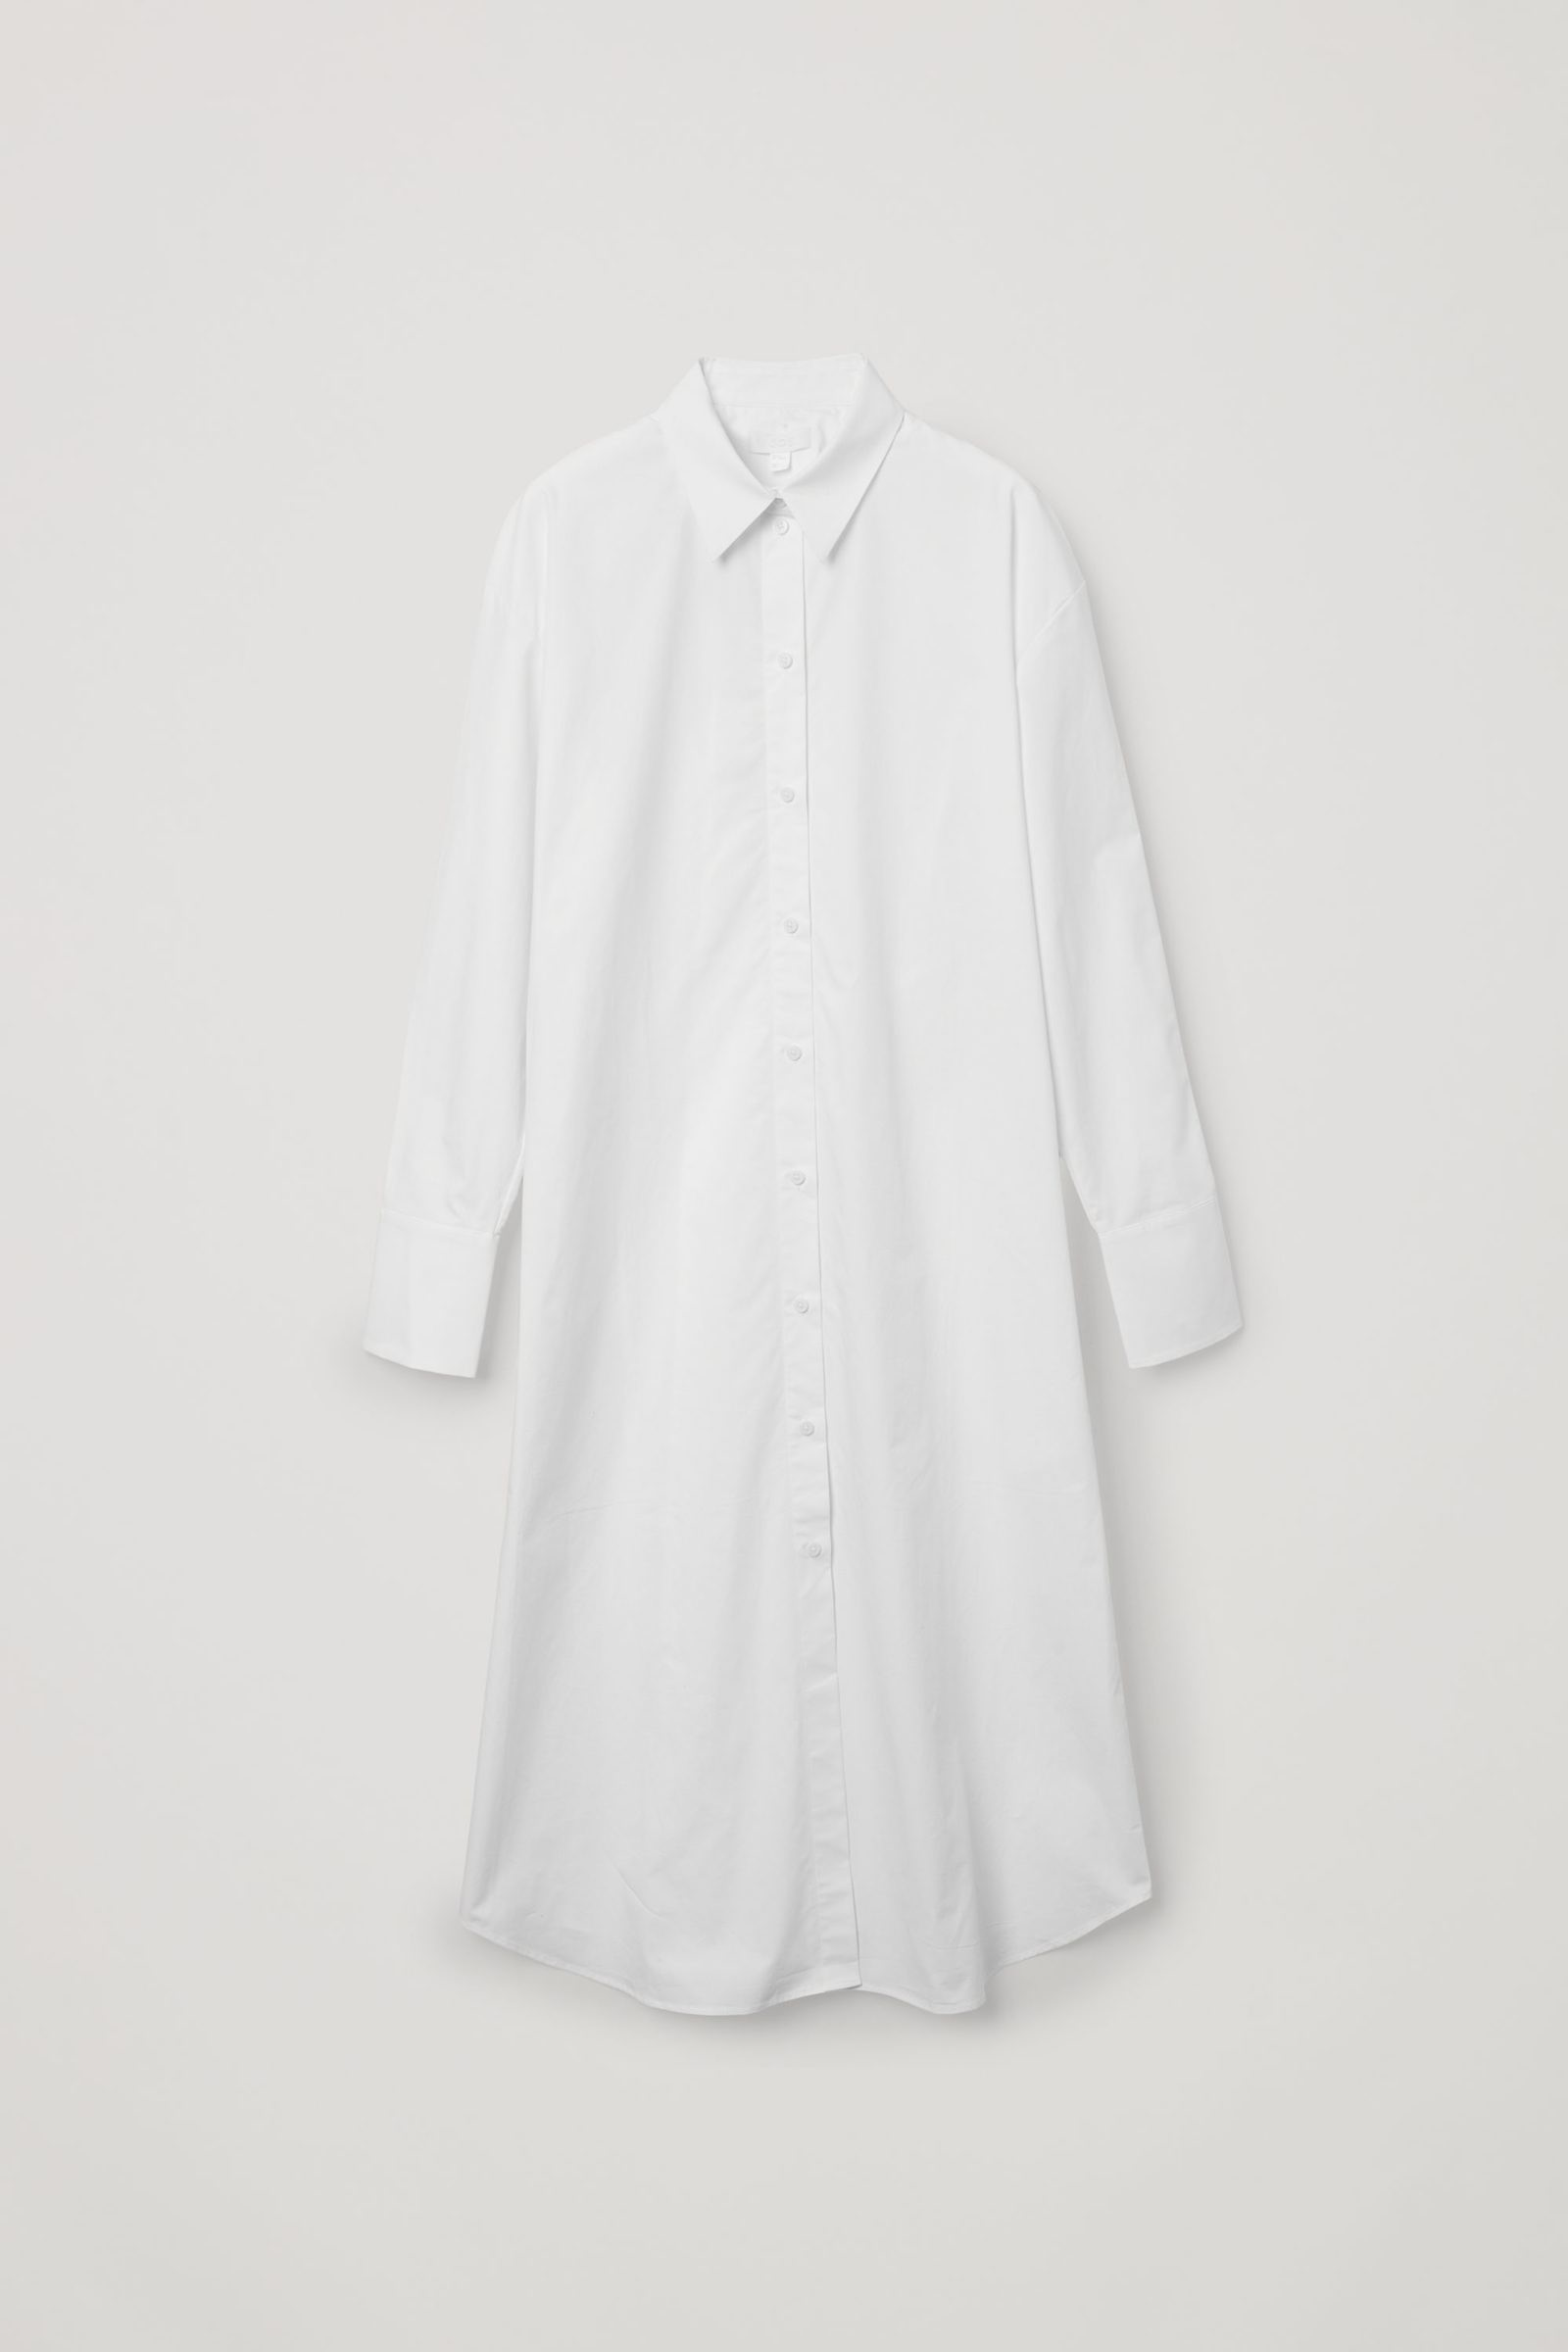 COS 오가닉 코튼 리어 플리츠 셔츠 드레스의 화이트컬러 Product입니다.